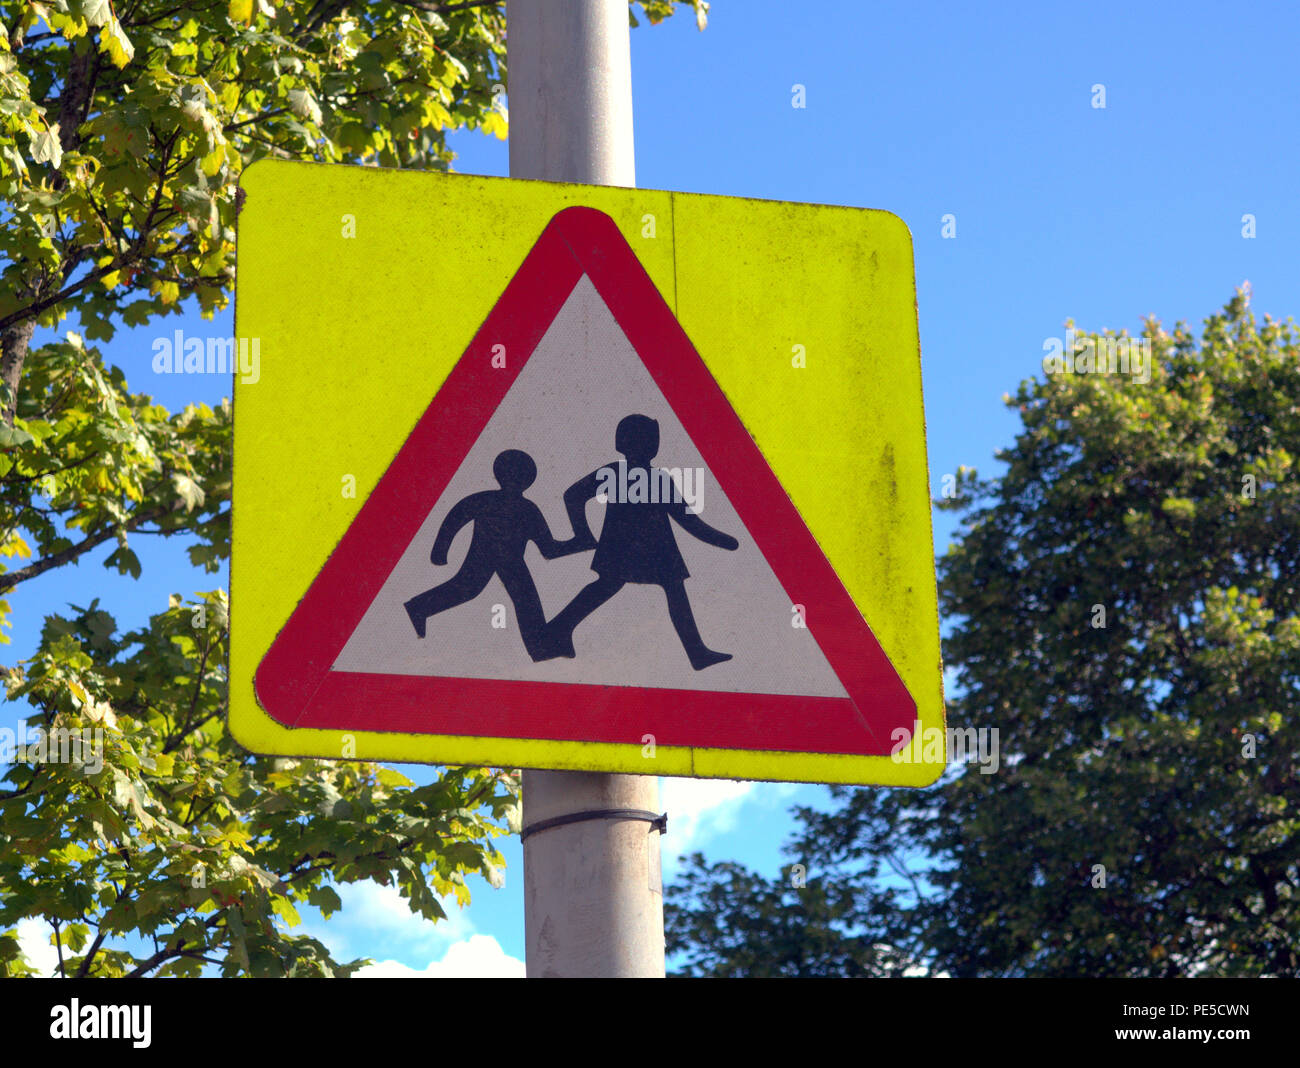 British road sign  schoolchildren children  crossing road warning sign blue sky - Stock Image